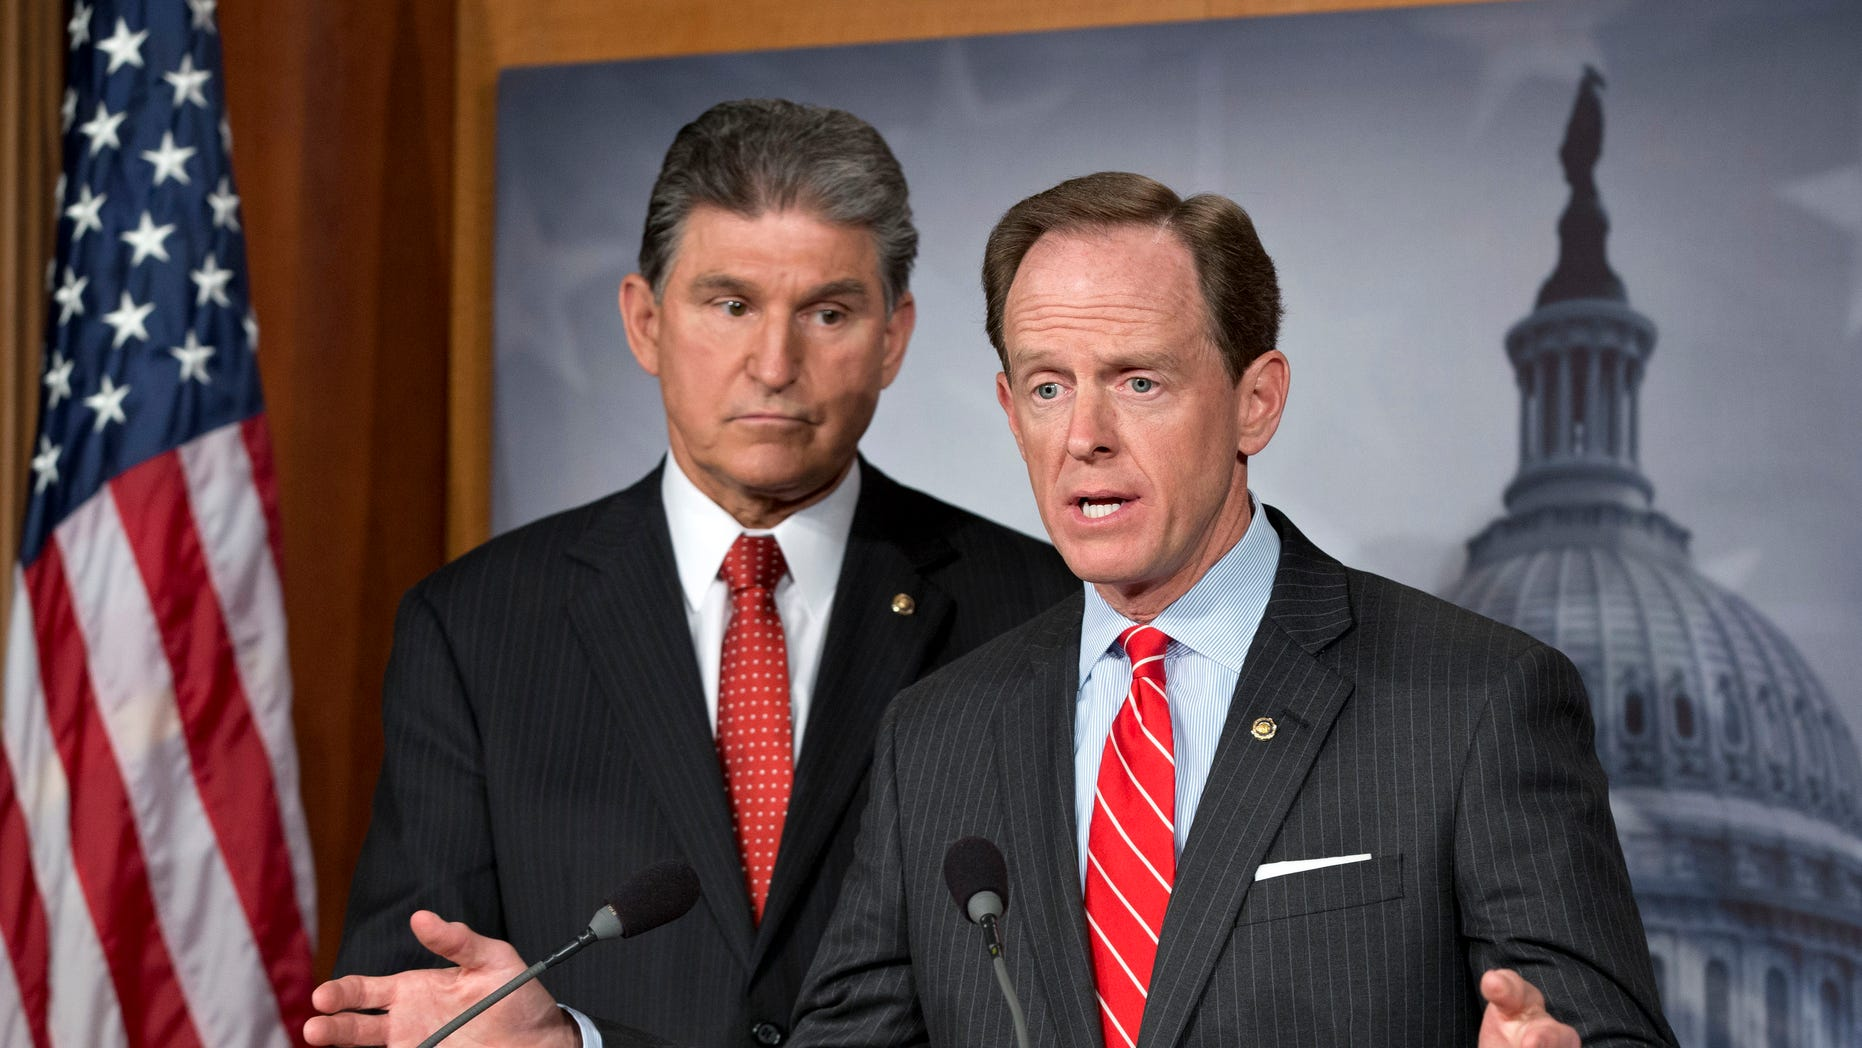 FILE: April 10, 2013: Sen. Joe Manchin, D-W.V., left, and Patrick Toomey, R-Pa., announce a deal on gun-control legislation, on Capitol Hill, in Washington, D.C.